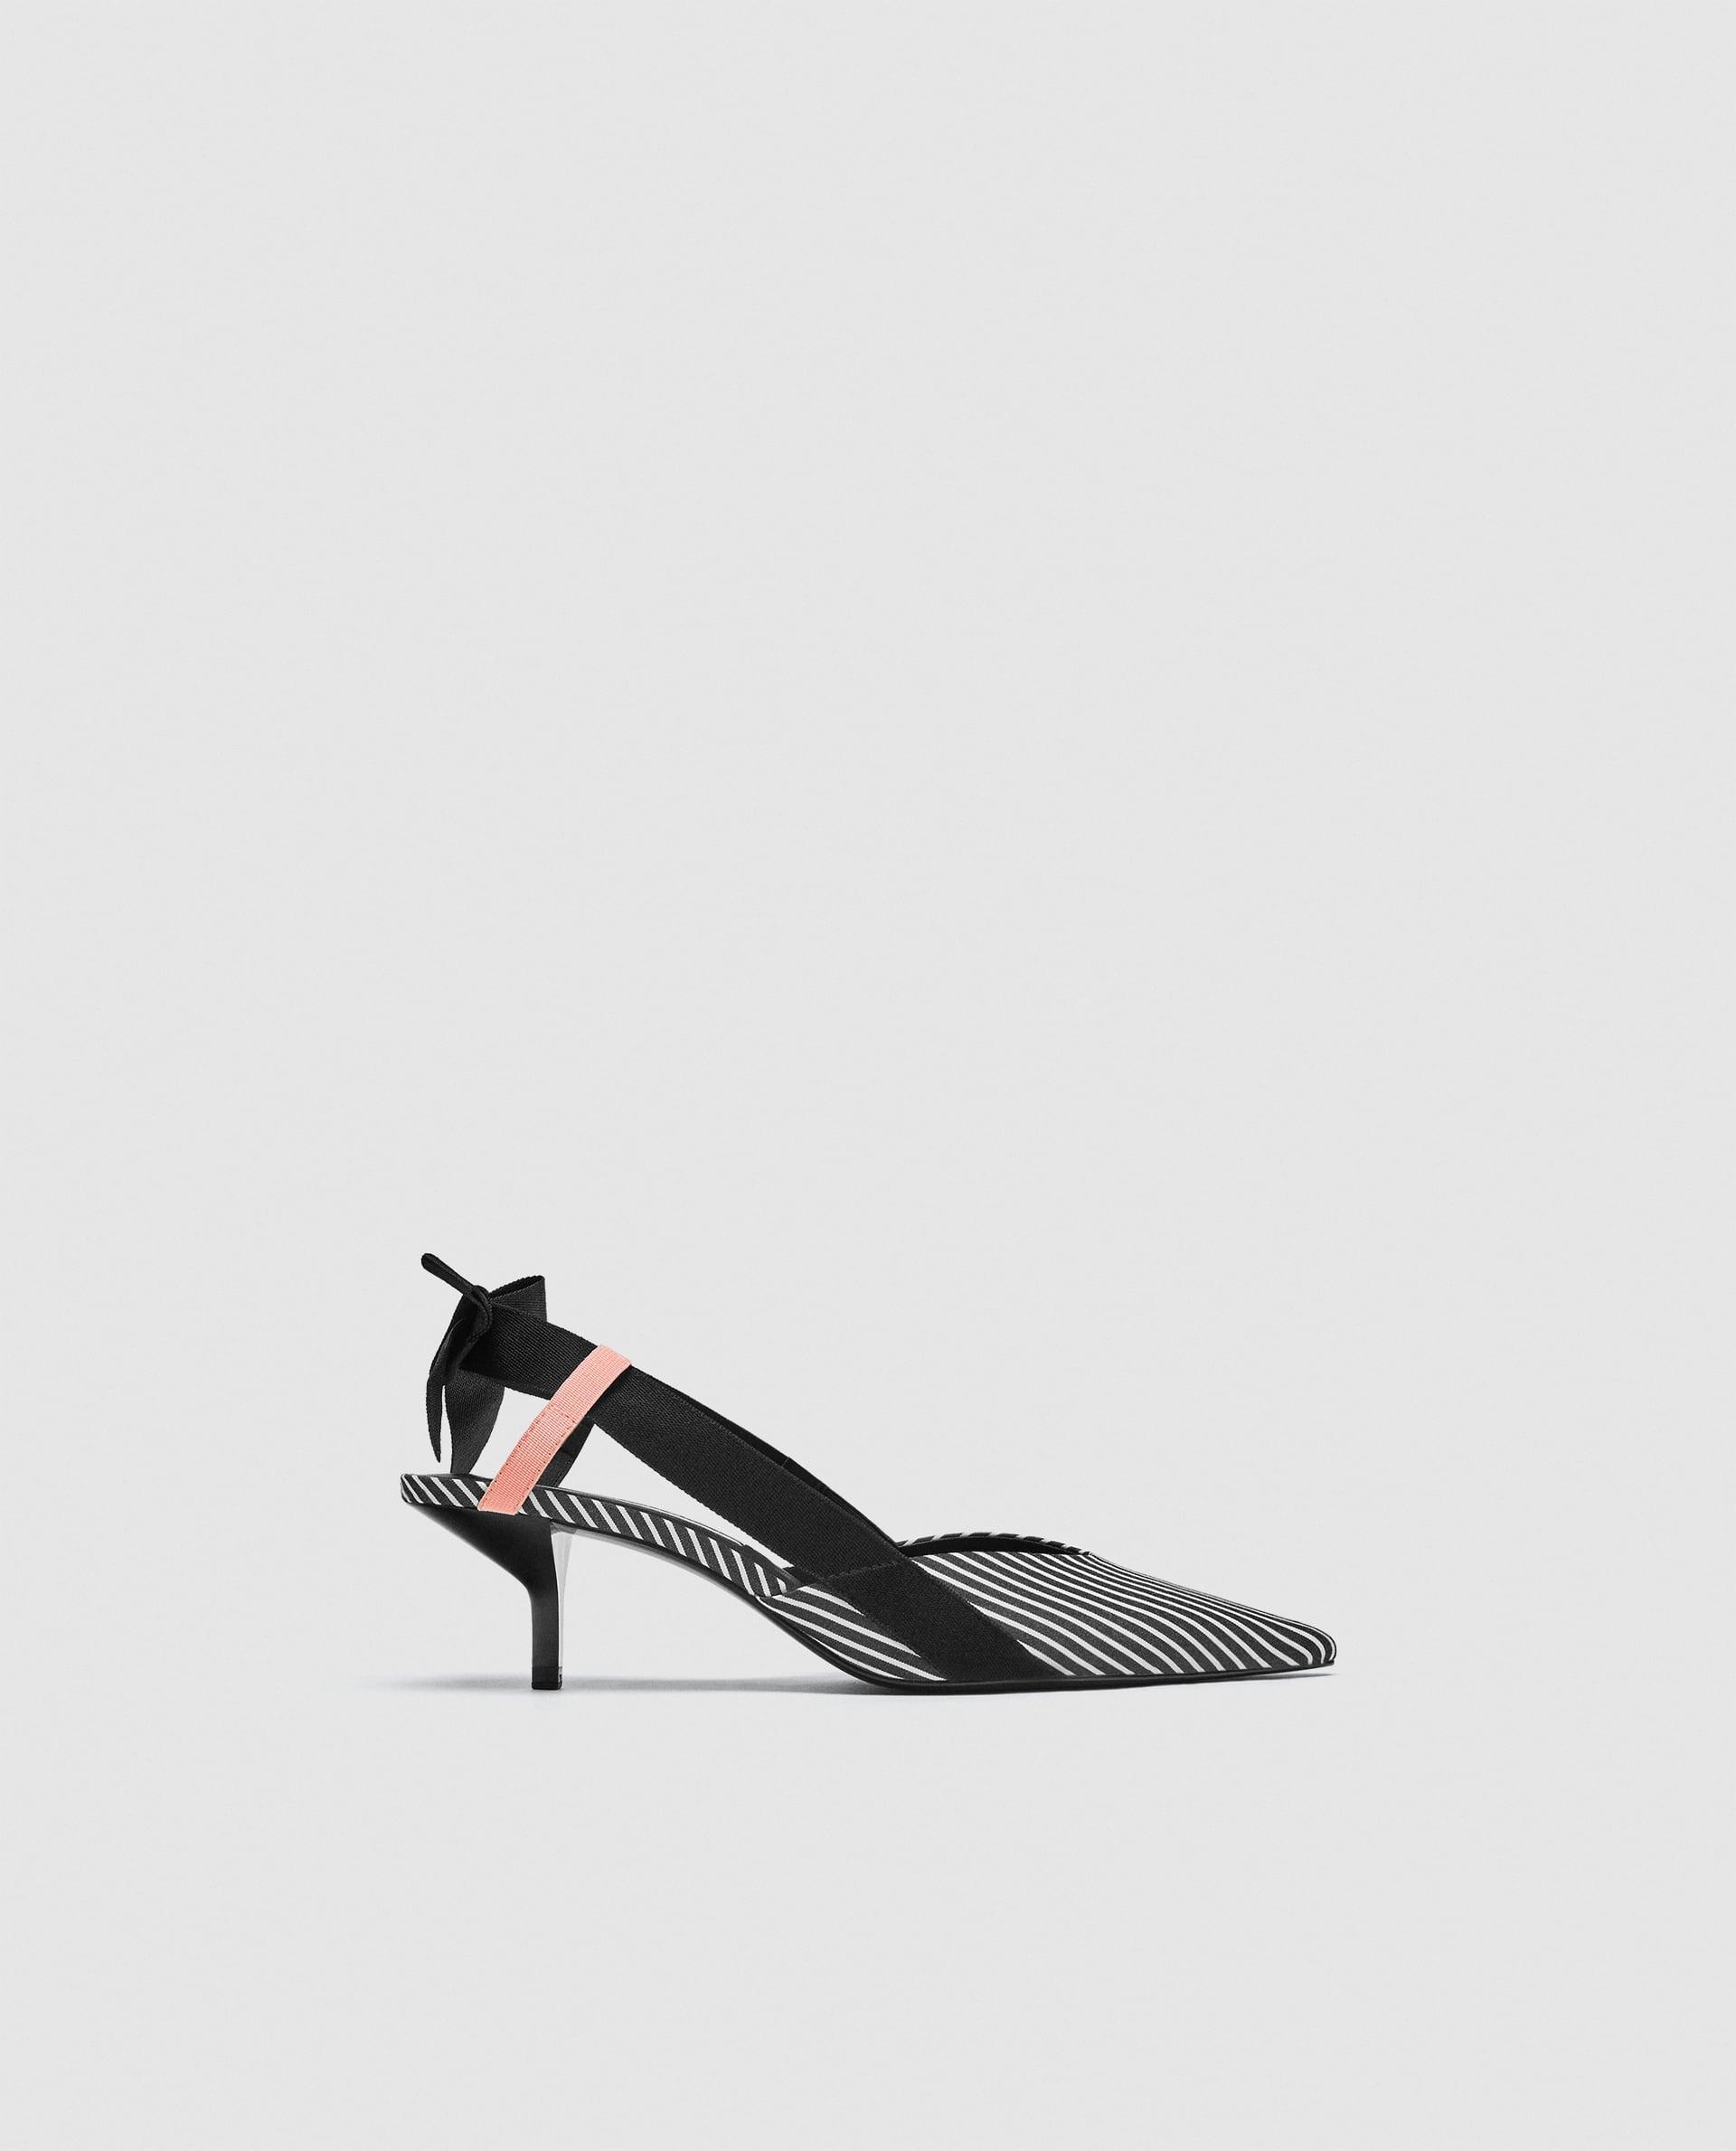 Scarpe Zara P 2018 e Natasha's Con Way I Tacchi Righe w6qfRwU